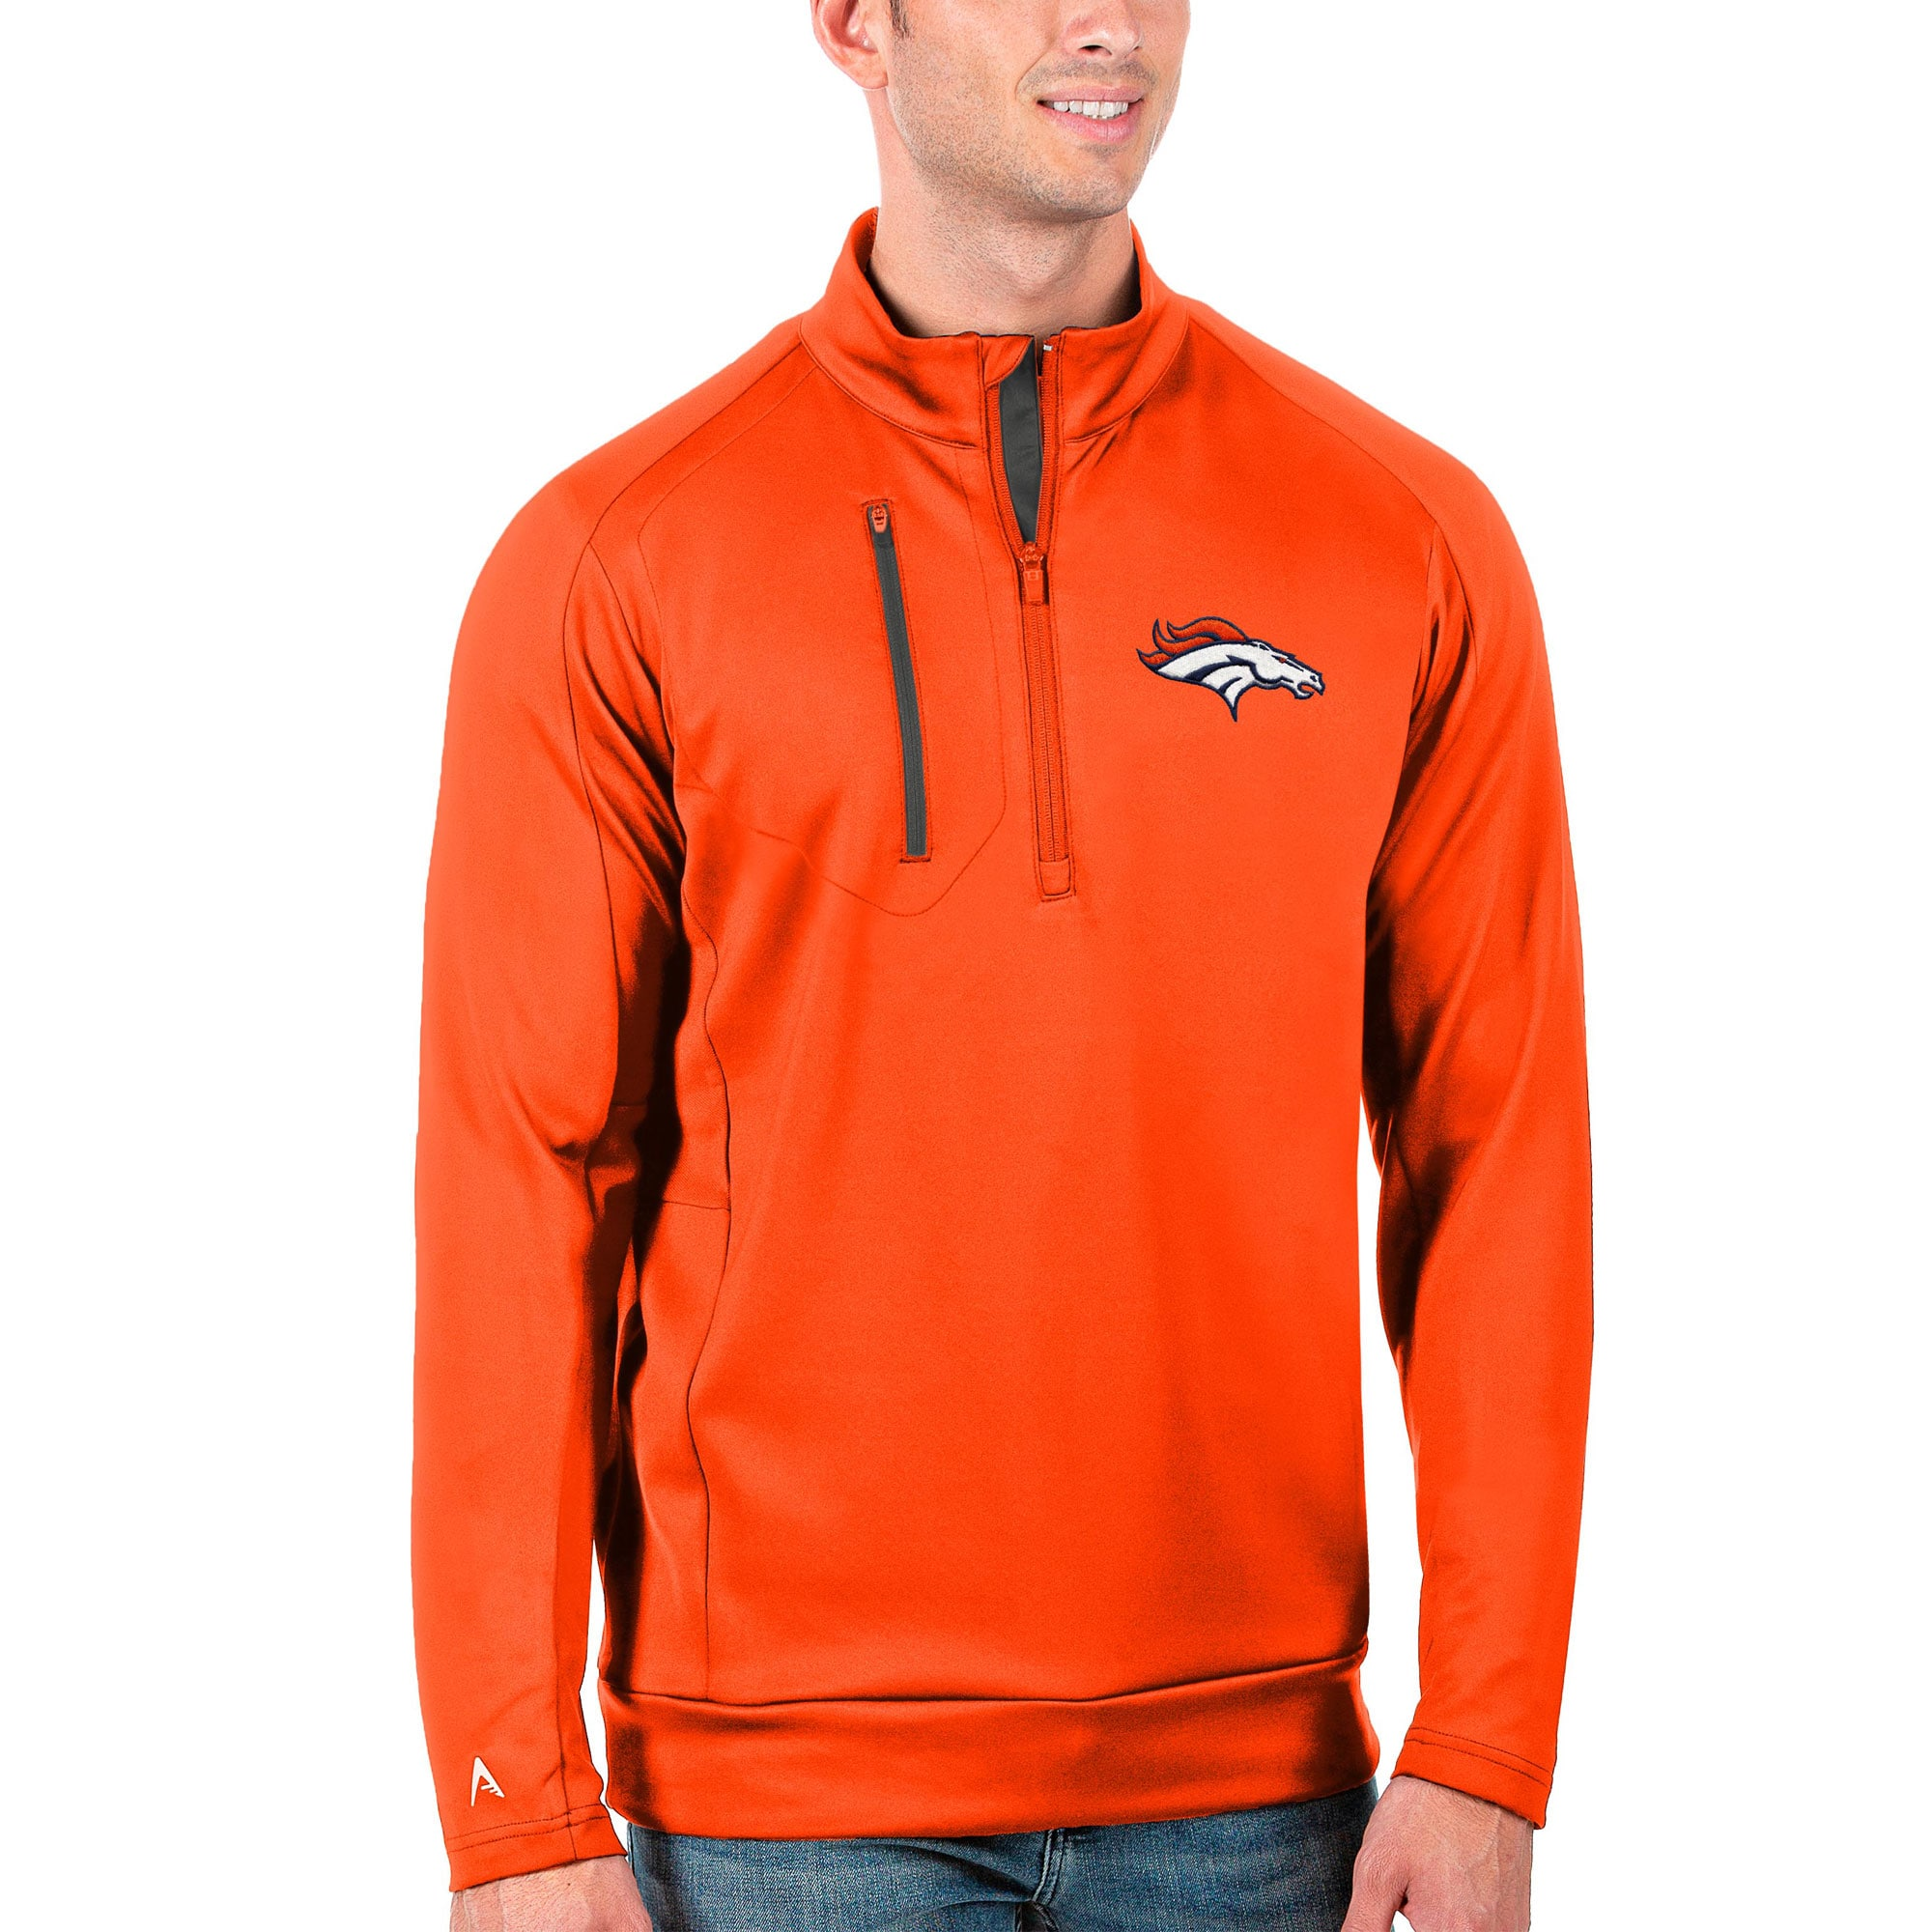 Denver Broncos Antigua Generation Quarter-Zip Pullover Jacket - Orange/Charcoal